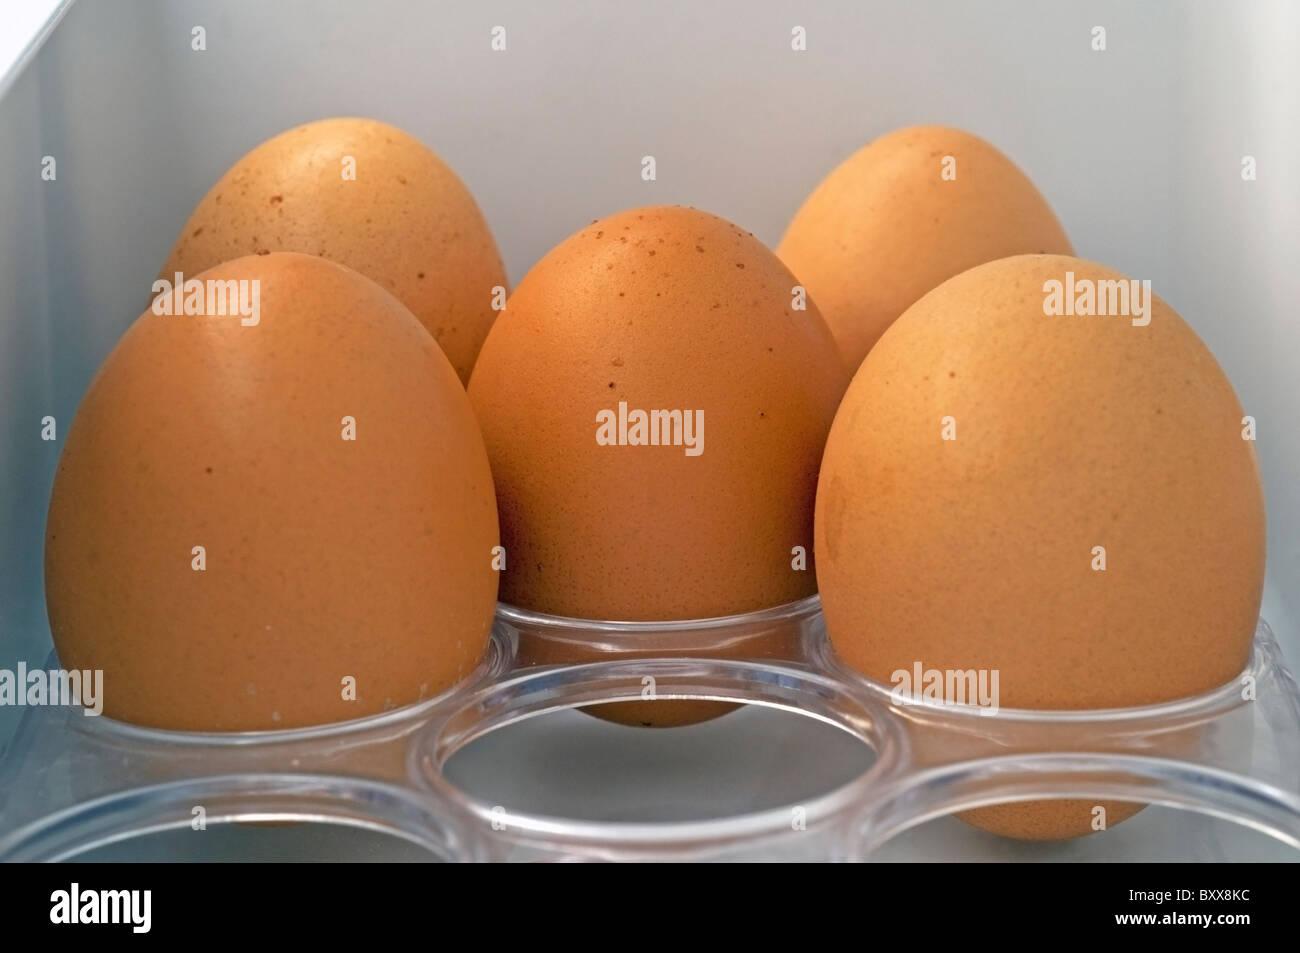 Eggsin frigorifero Immagini Stock